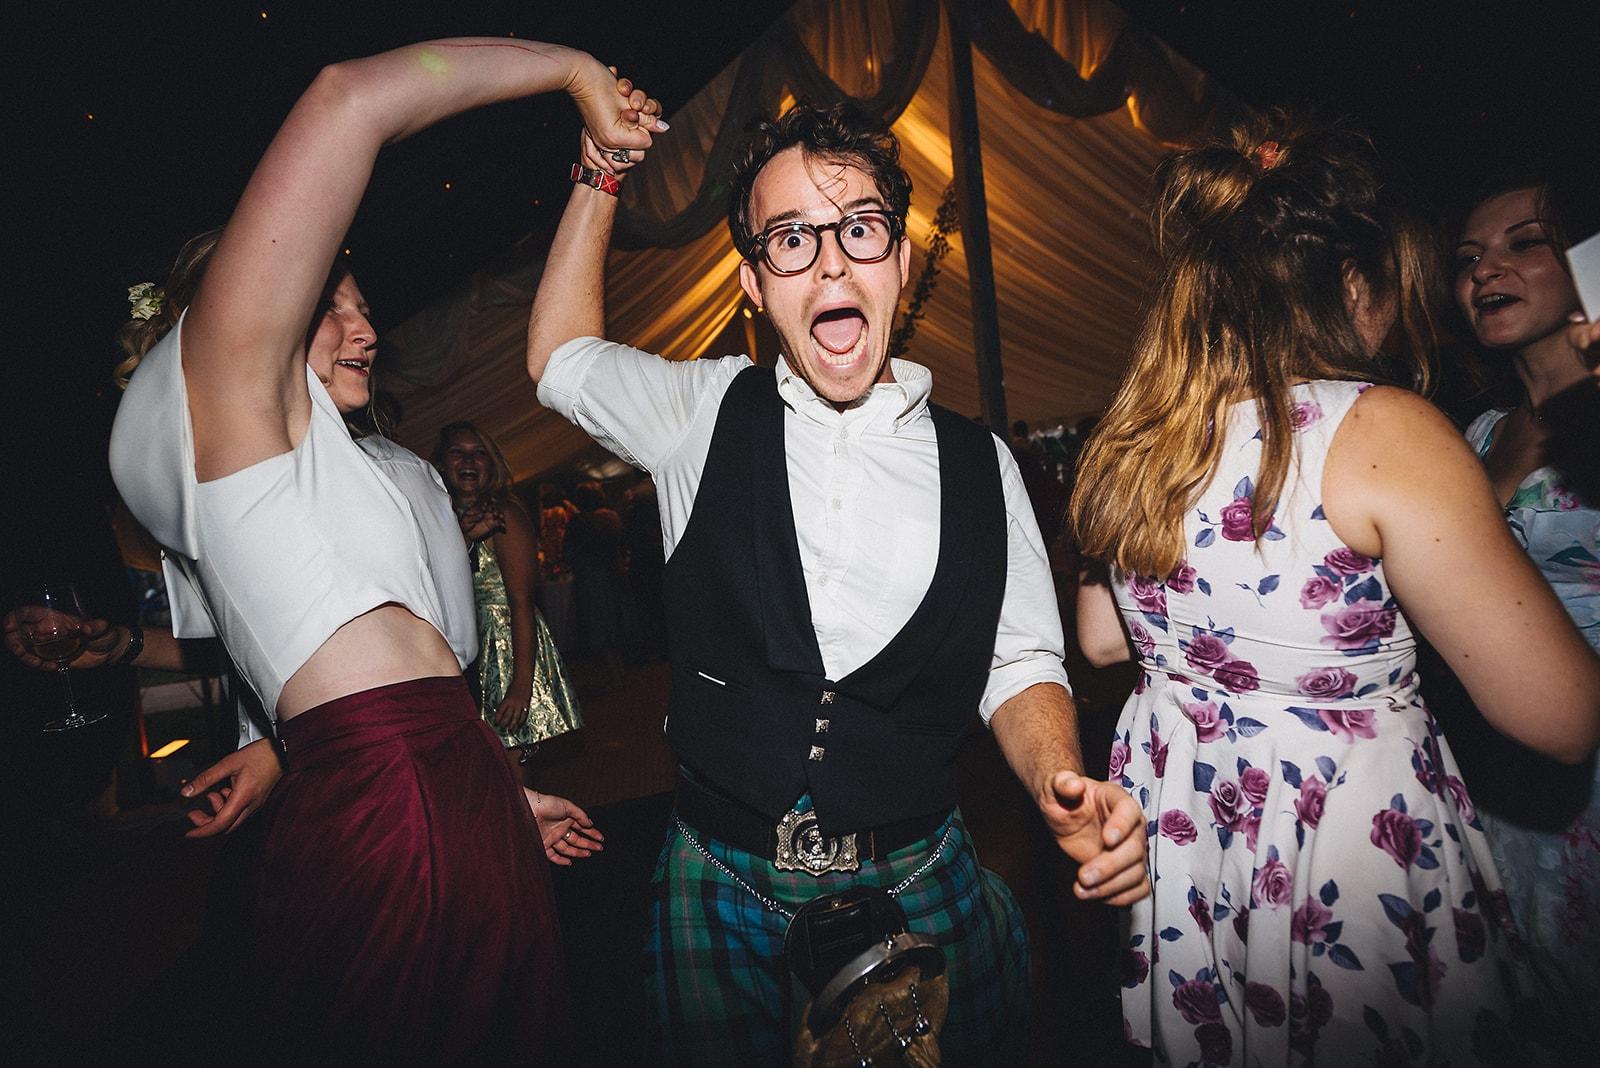 Wedding guests dancing singing loudly at a joyful Cambridge wedding